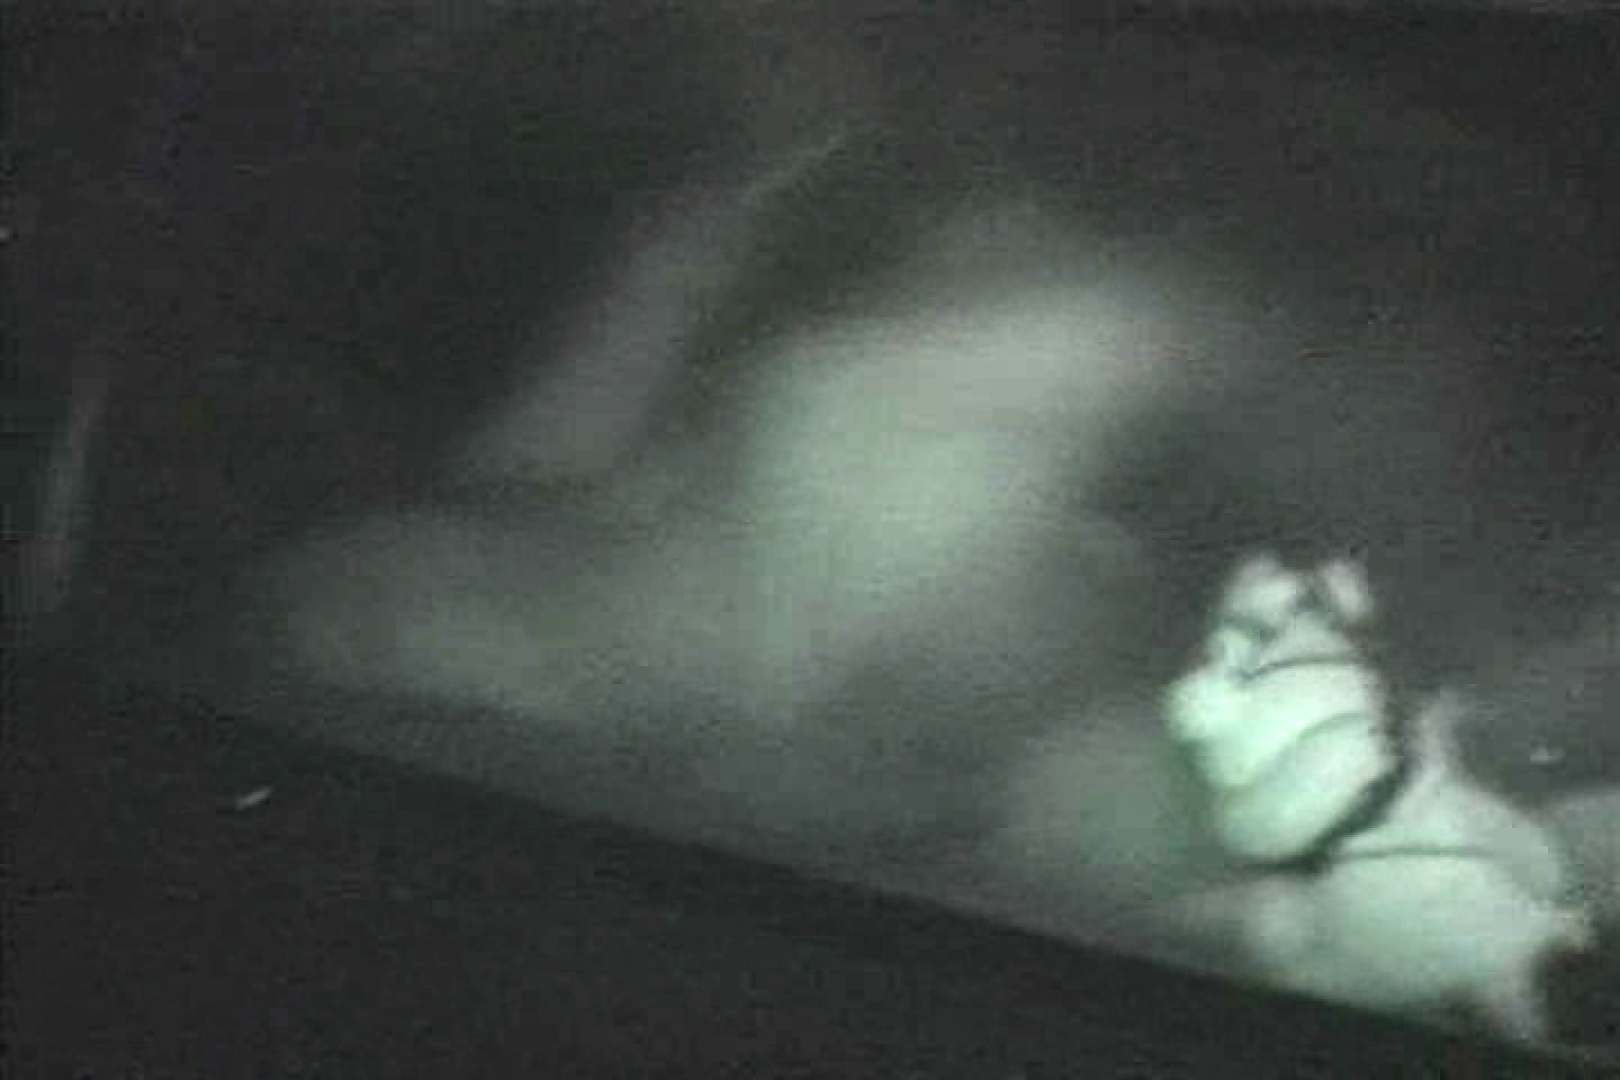 MASAさんの待ち伏せ撮り! 赤外線カーセックスVol.11 OLセックス 盗撮セックス無修正動画無料 81画像 74